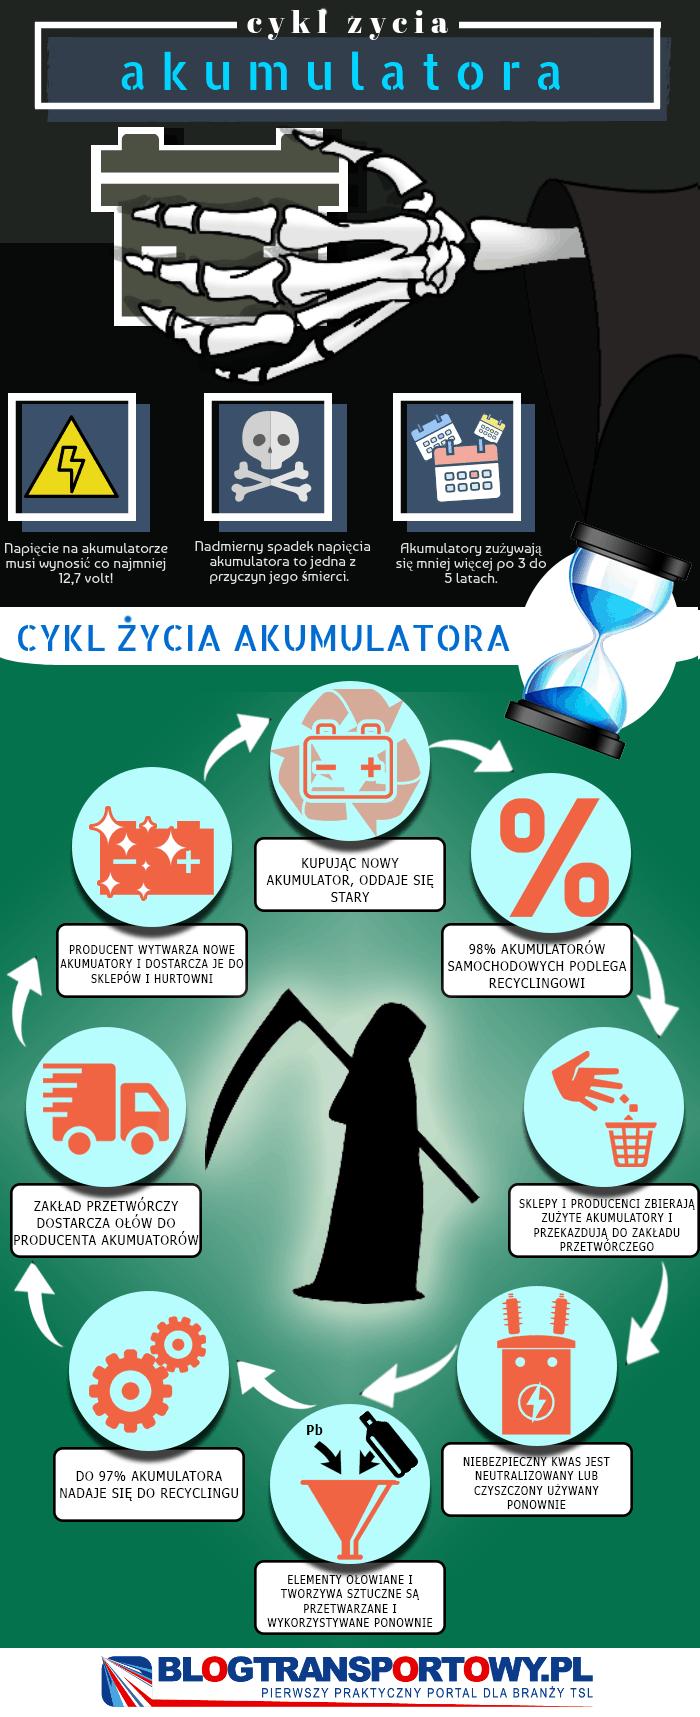 Cykl życia akumulatora